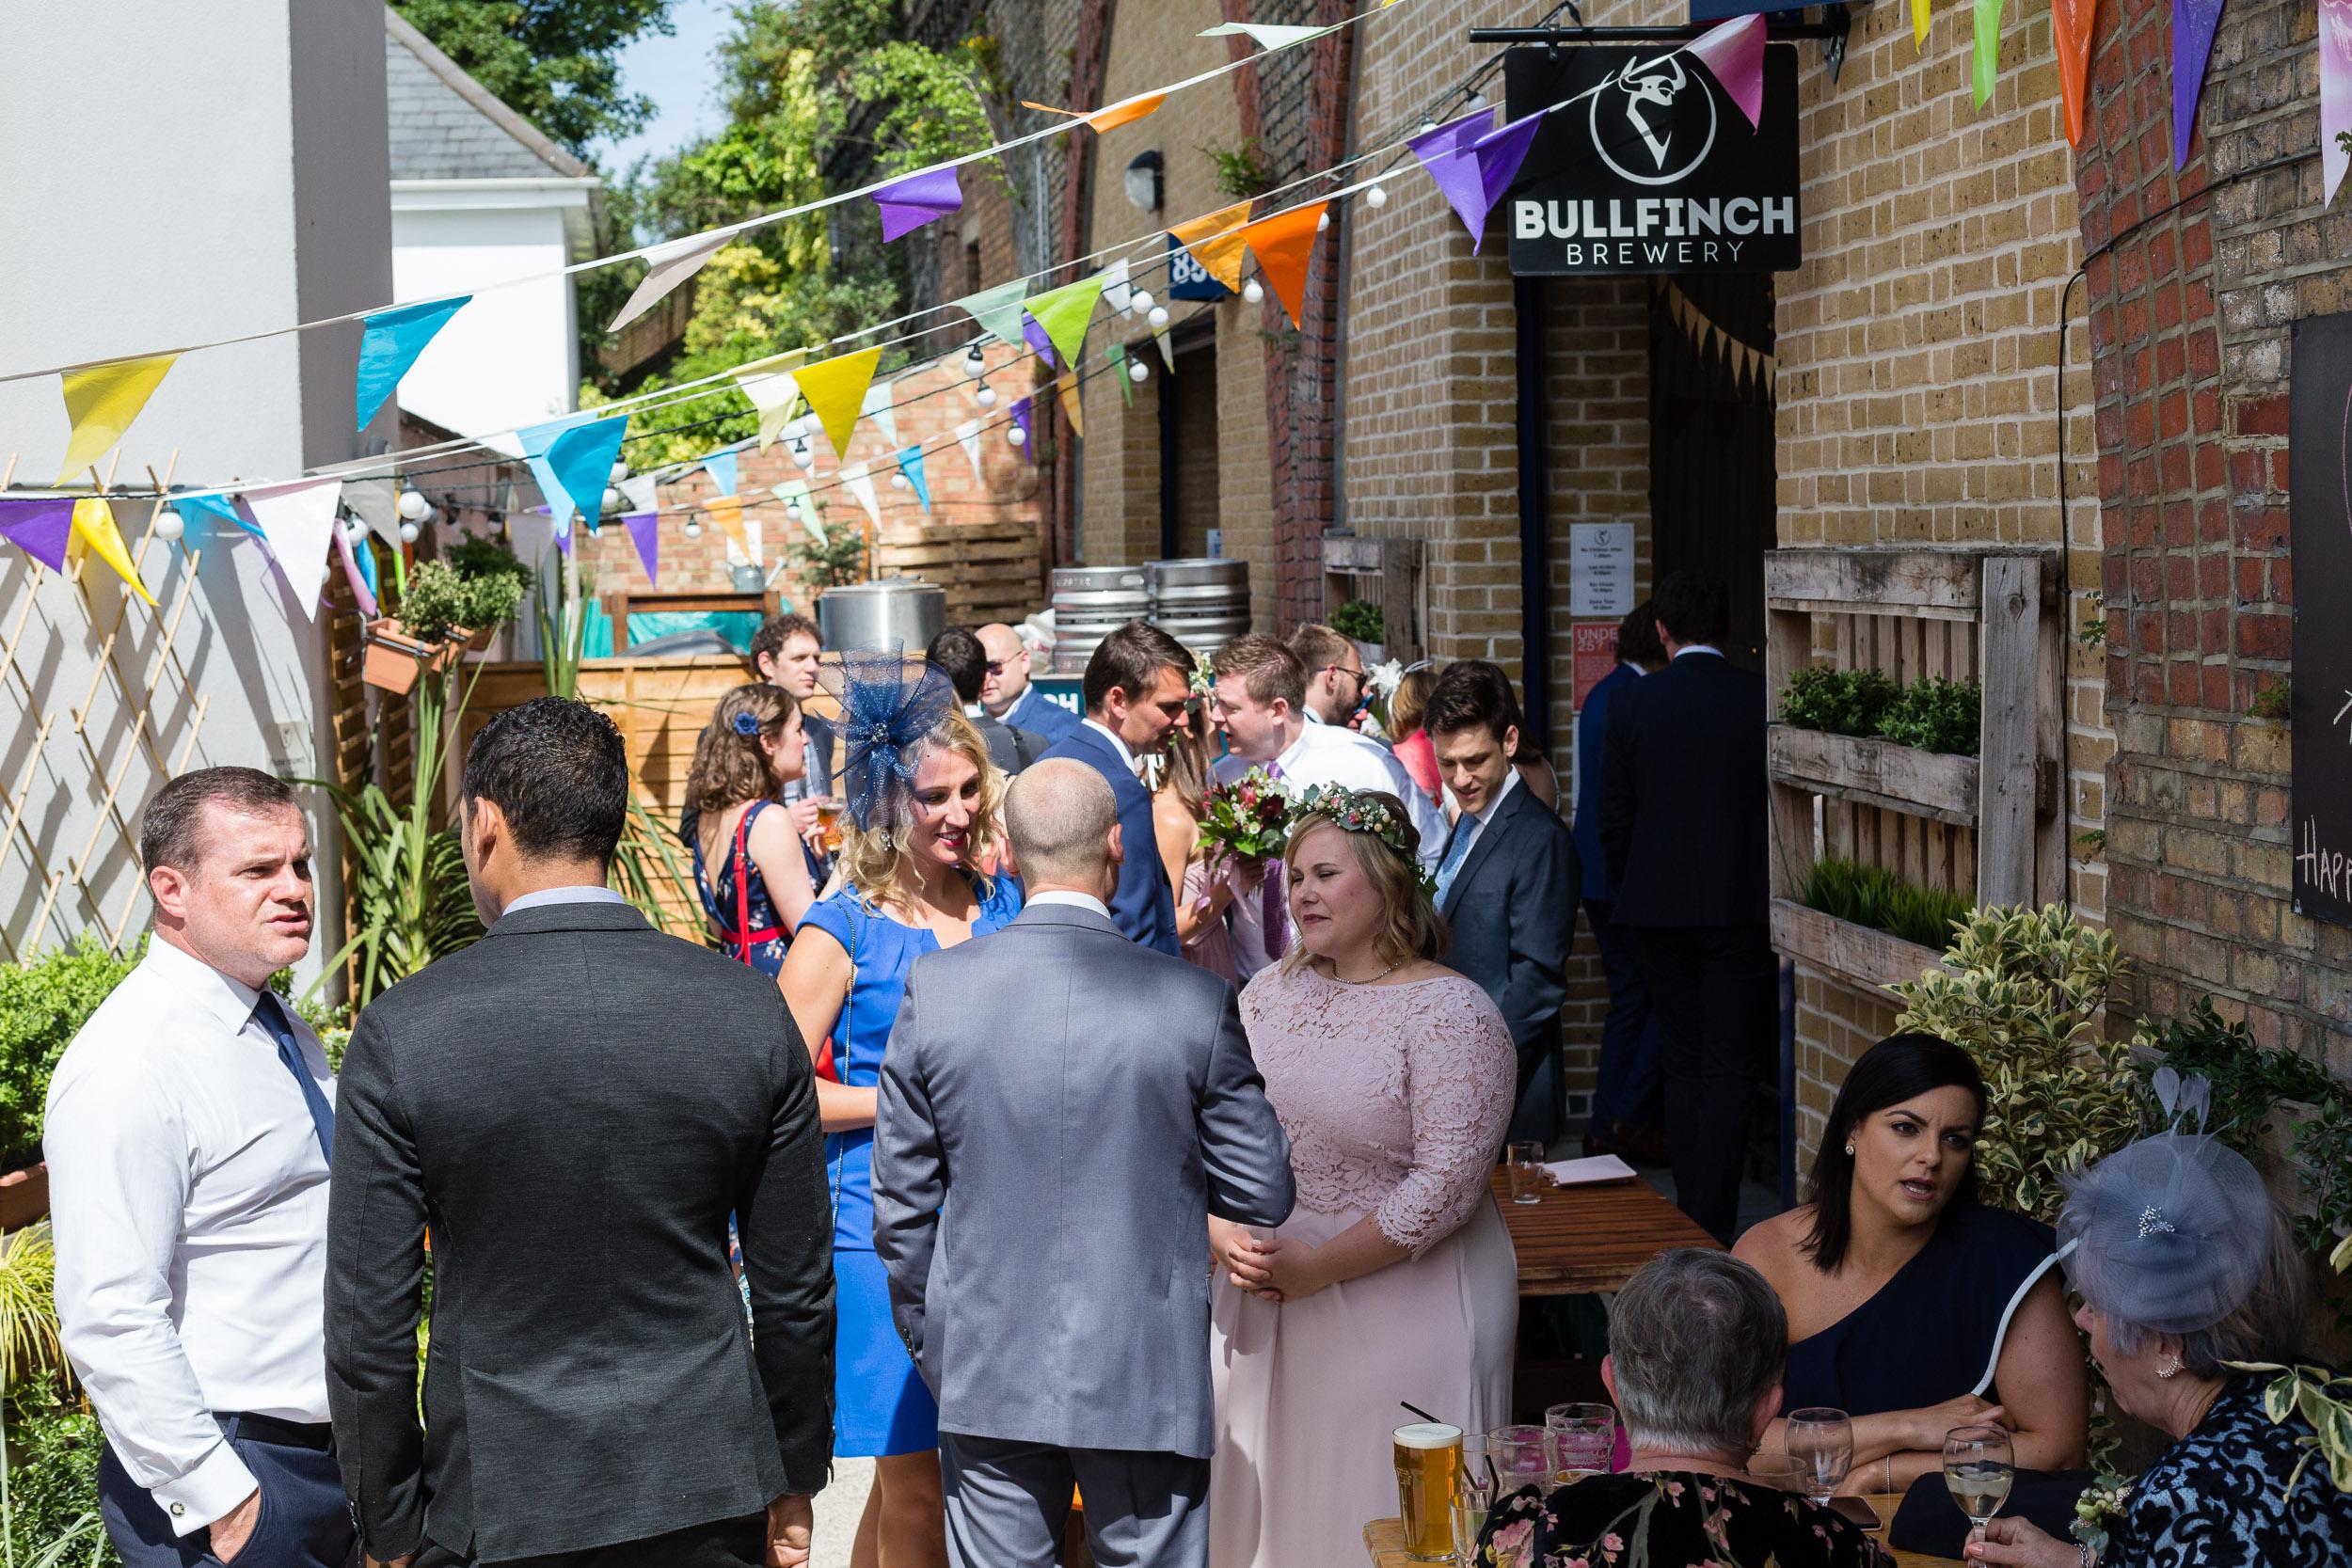 brockwell-lido-brixton-herne-hill-wedding-091.jpg